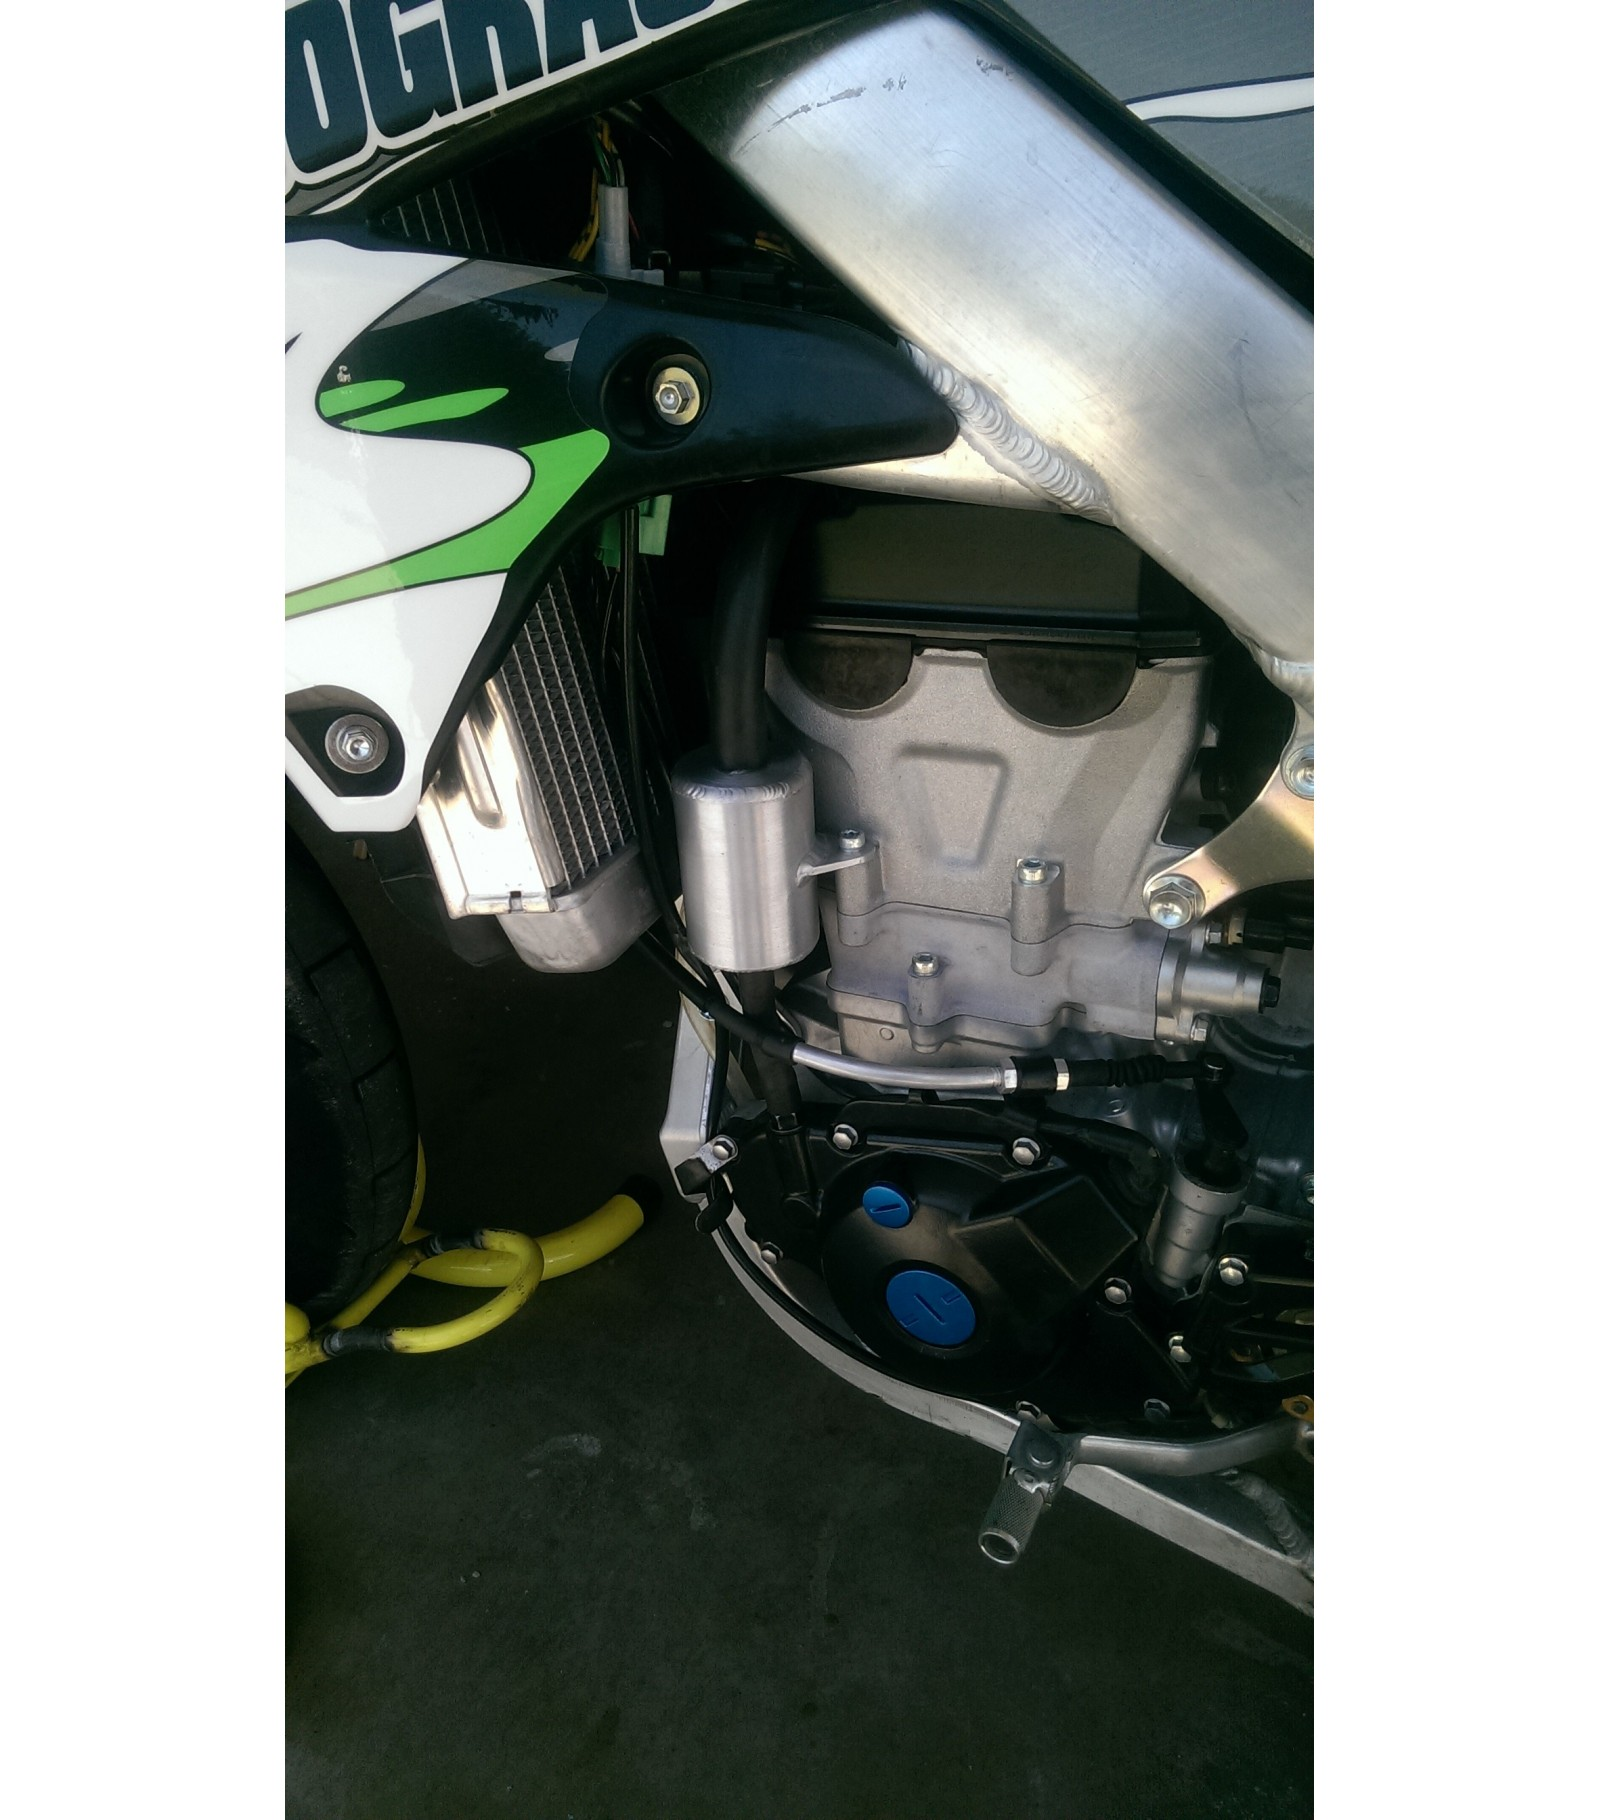 Kawasaki Oem Specialty Tools